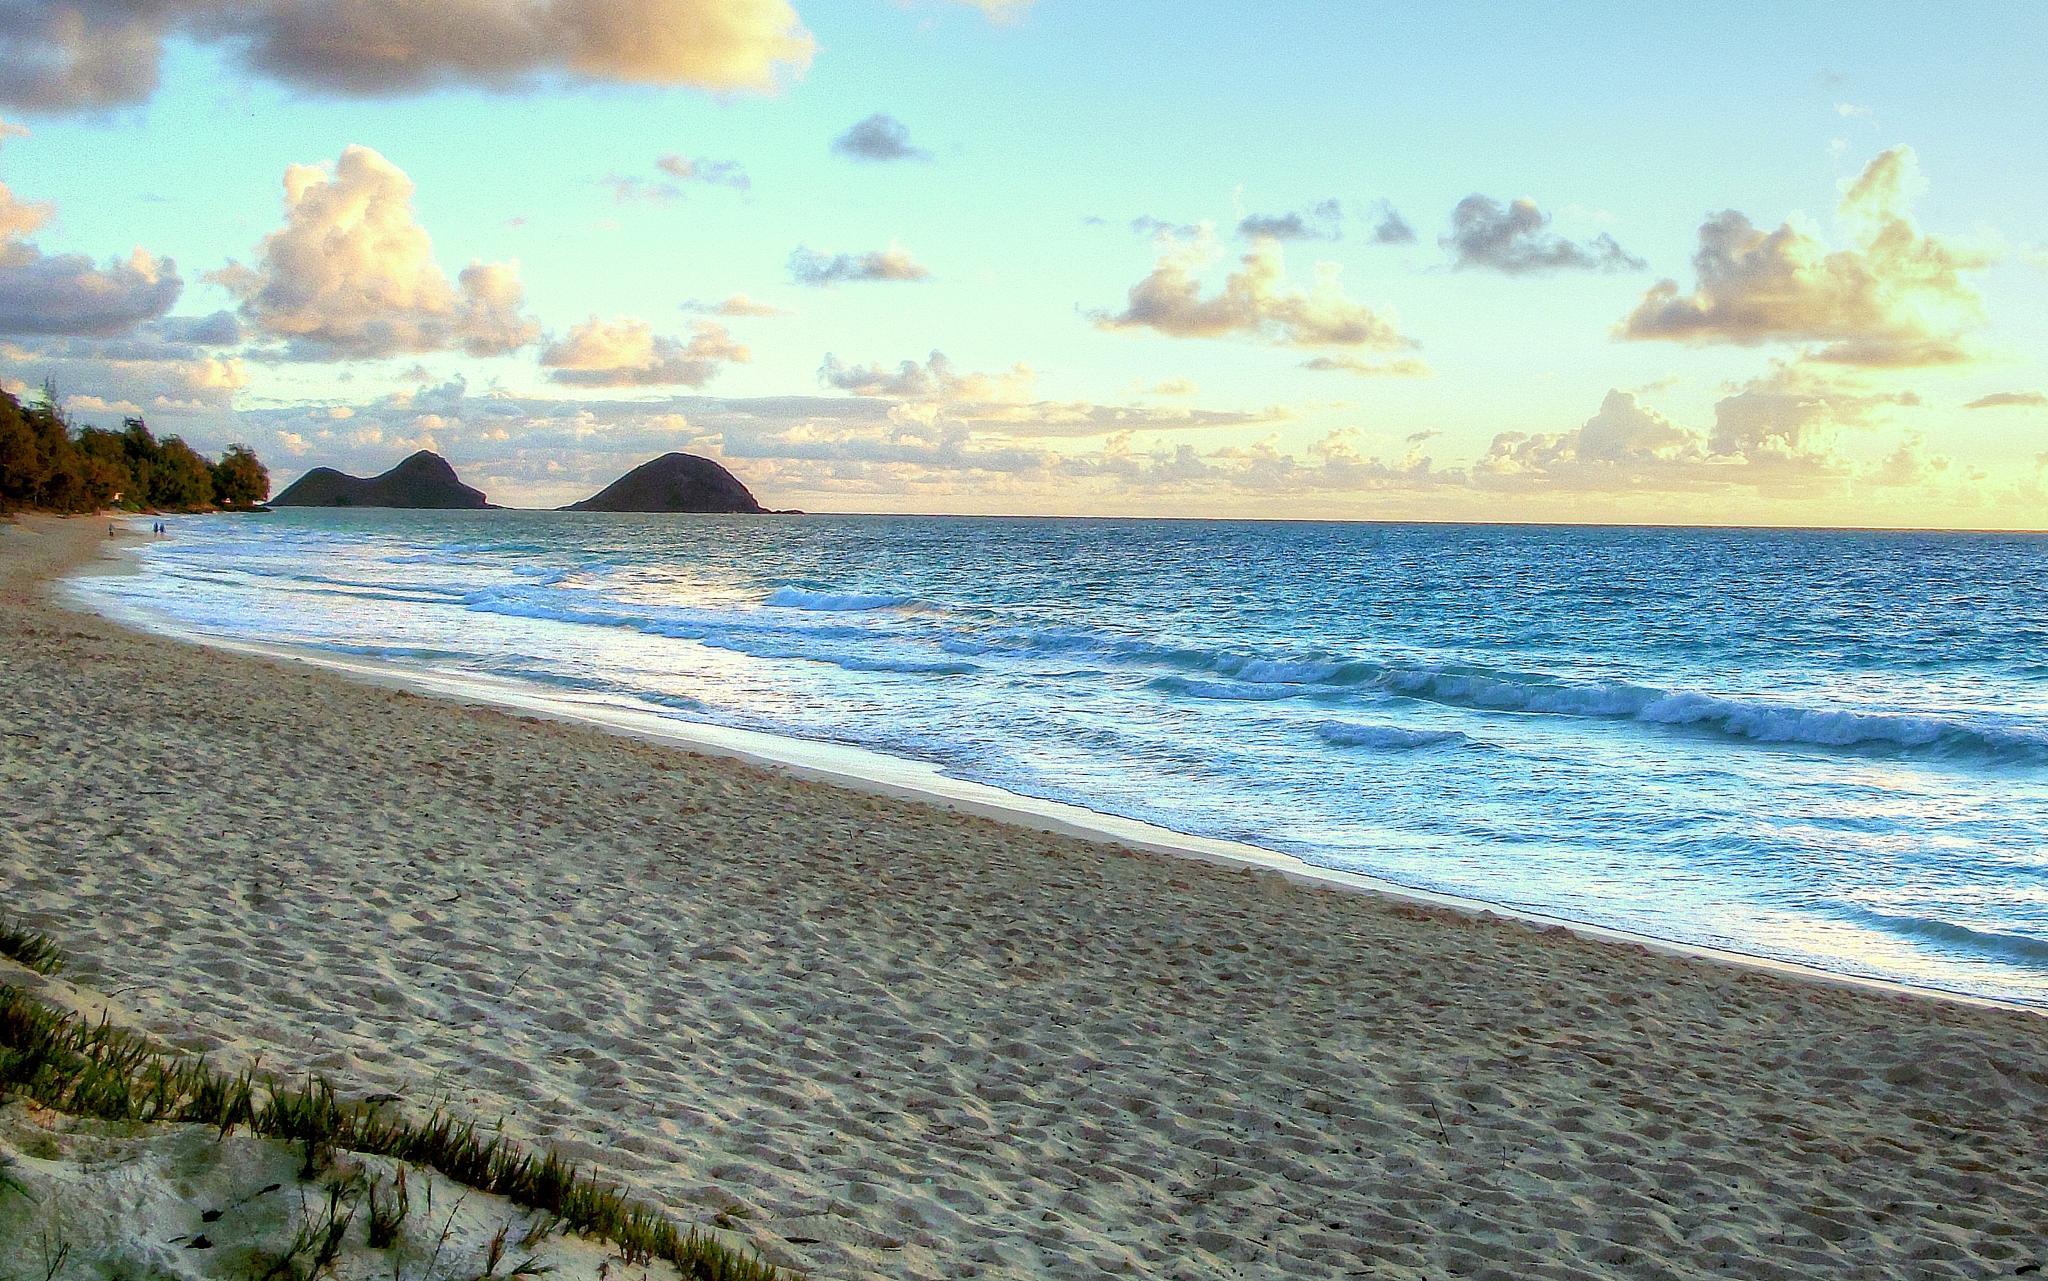 Hawaii by BANewson